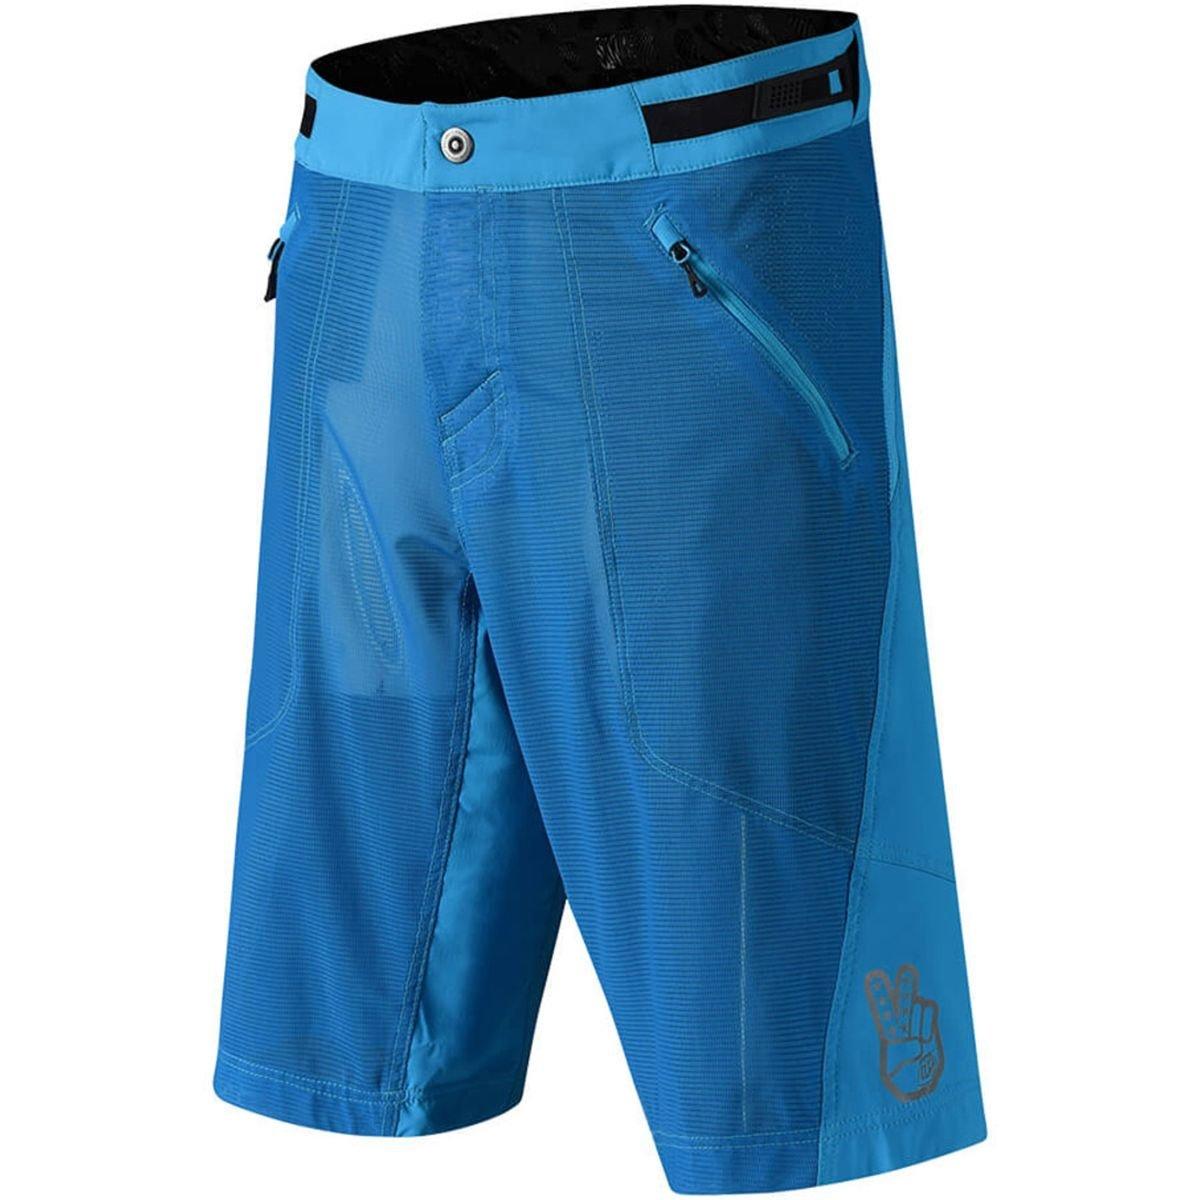 Troy Lee Designs Skyline Air Men's Off-Road BMX Shorts with Liner - Ocean / 30